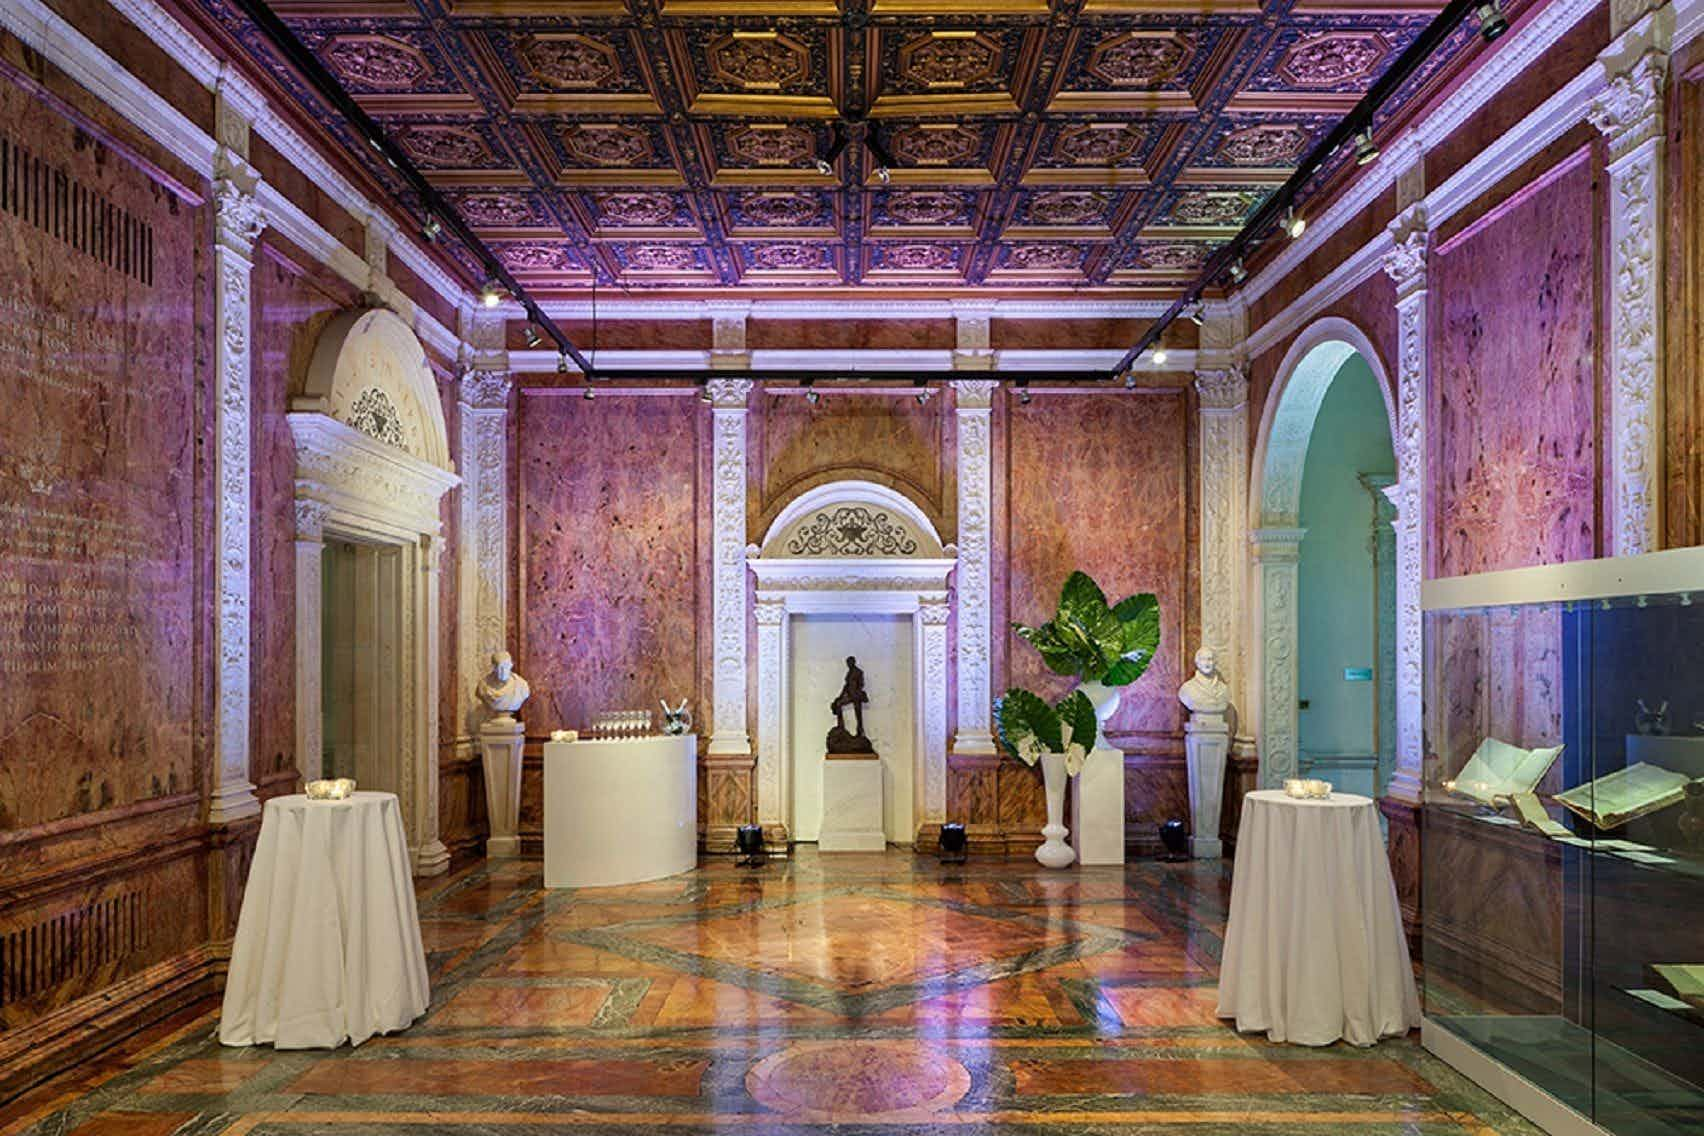 The Marble Hall., The Royal Society